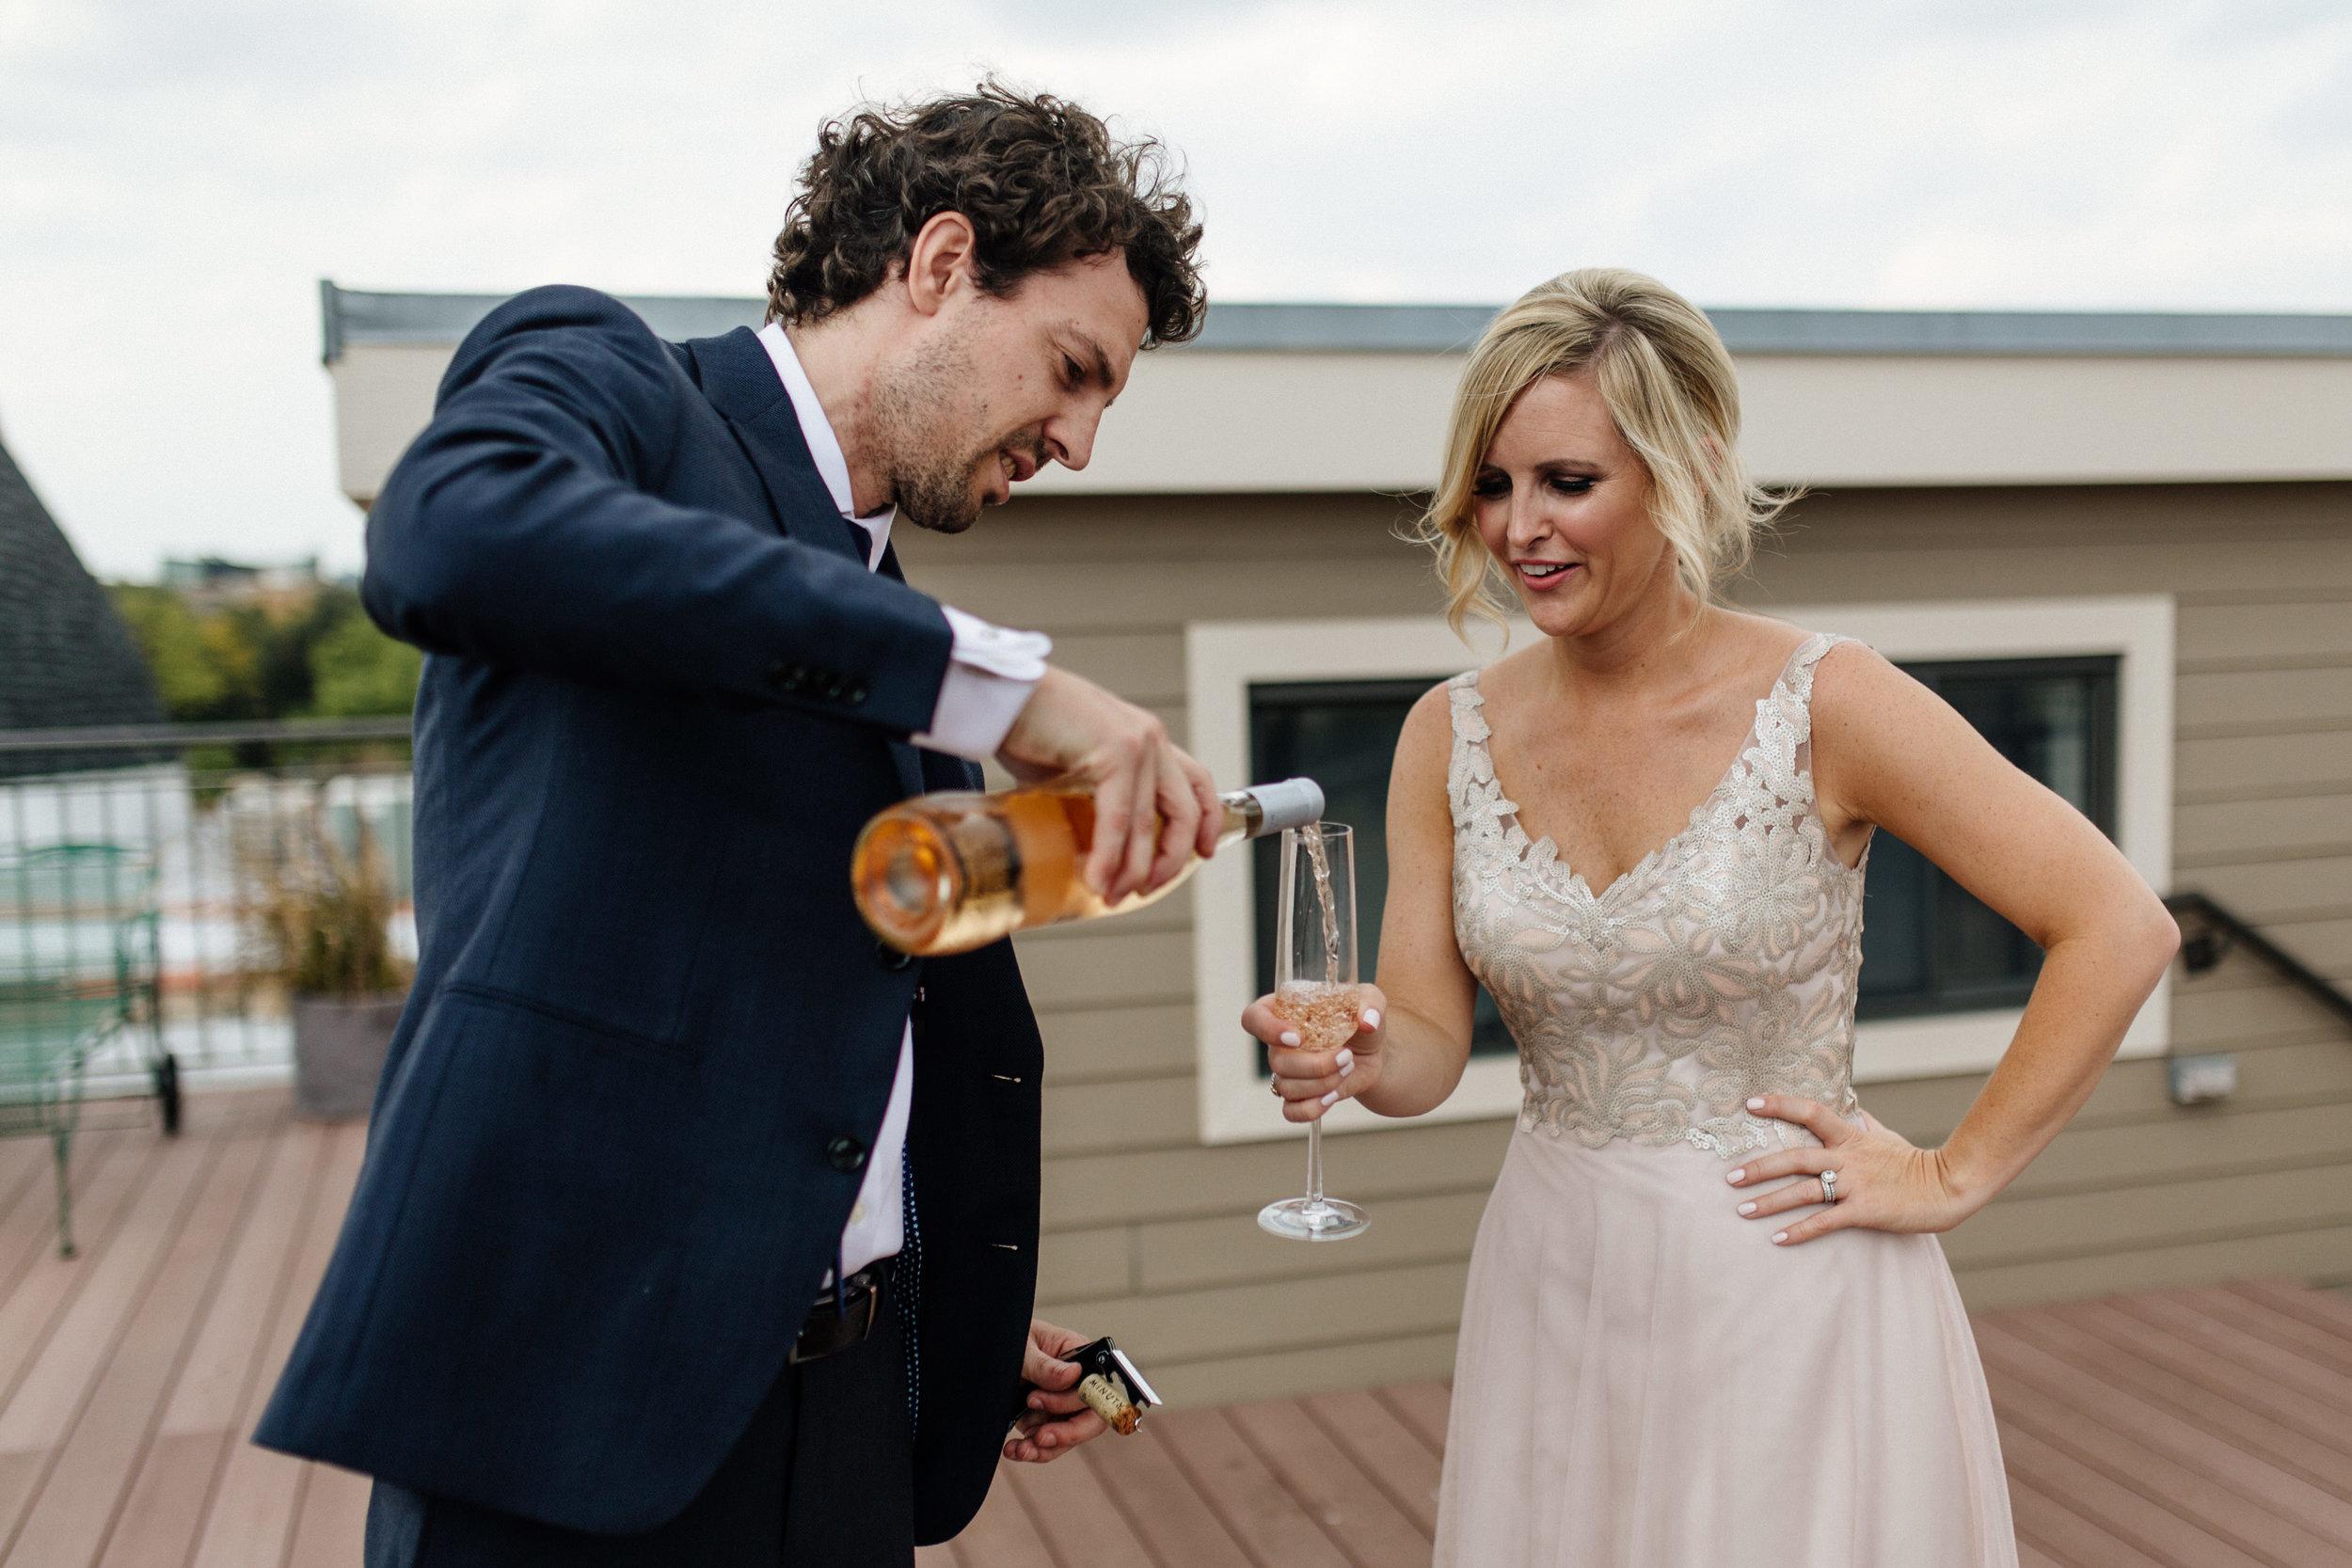 chicago-illuminating-company-wedding-019.jpg